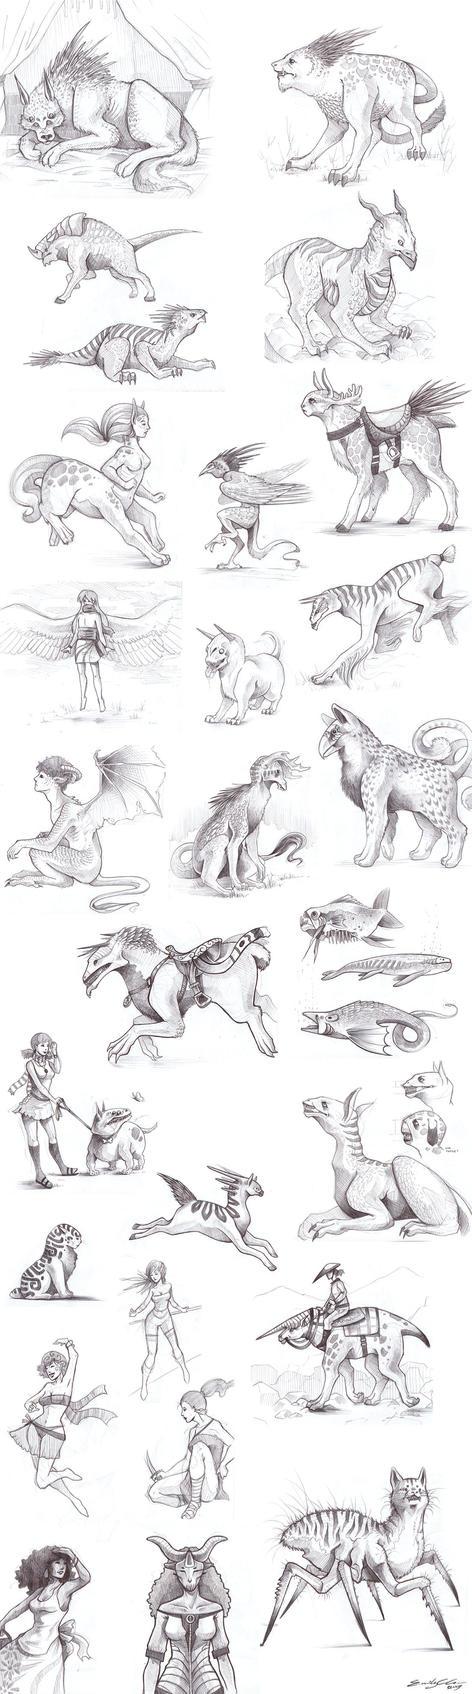 Sketchbook Crap Spring09 by SilentReaper